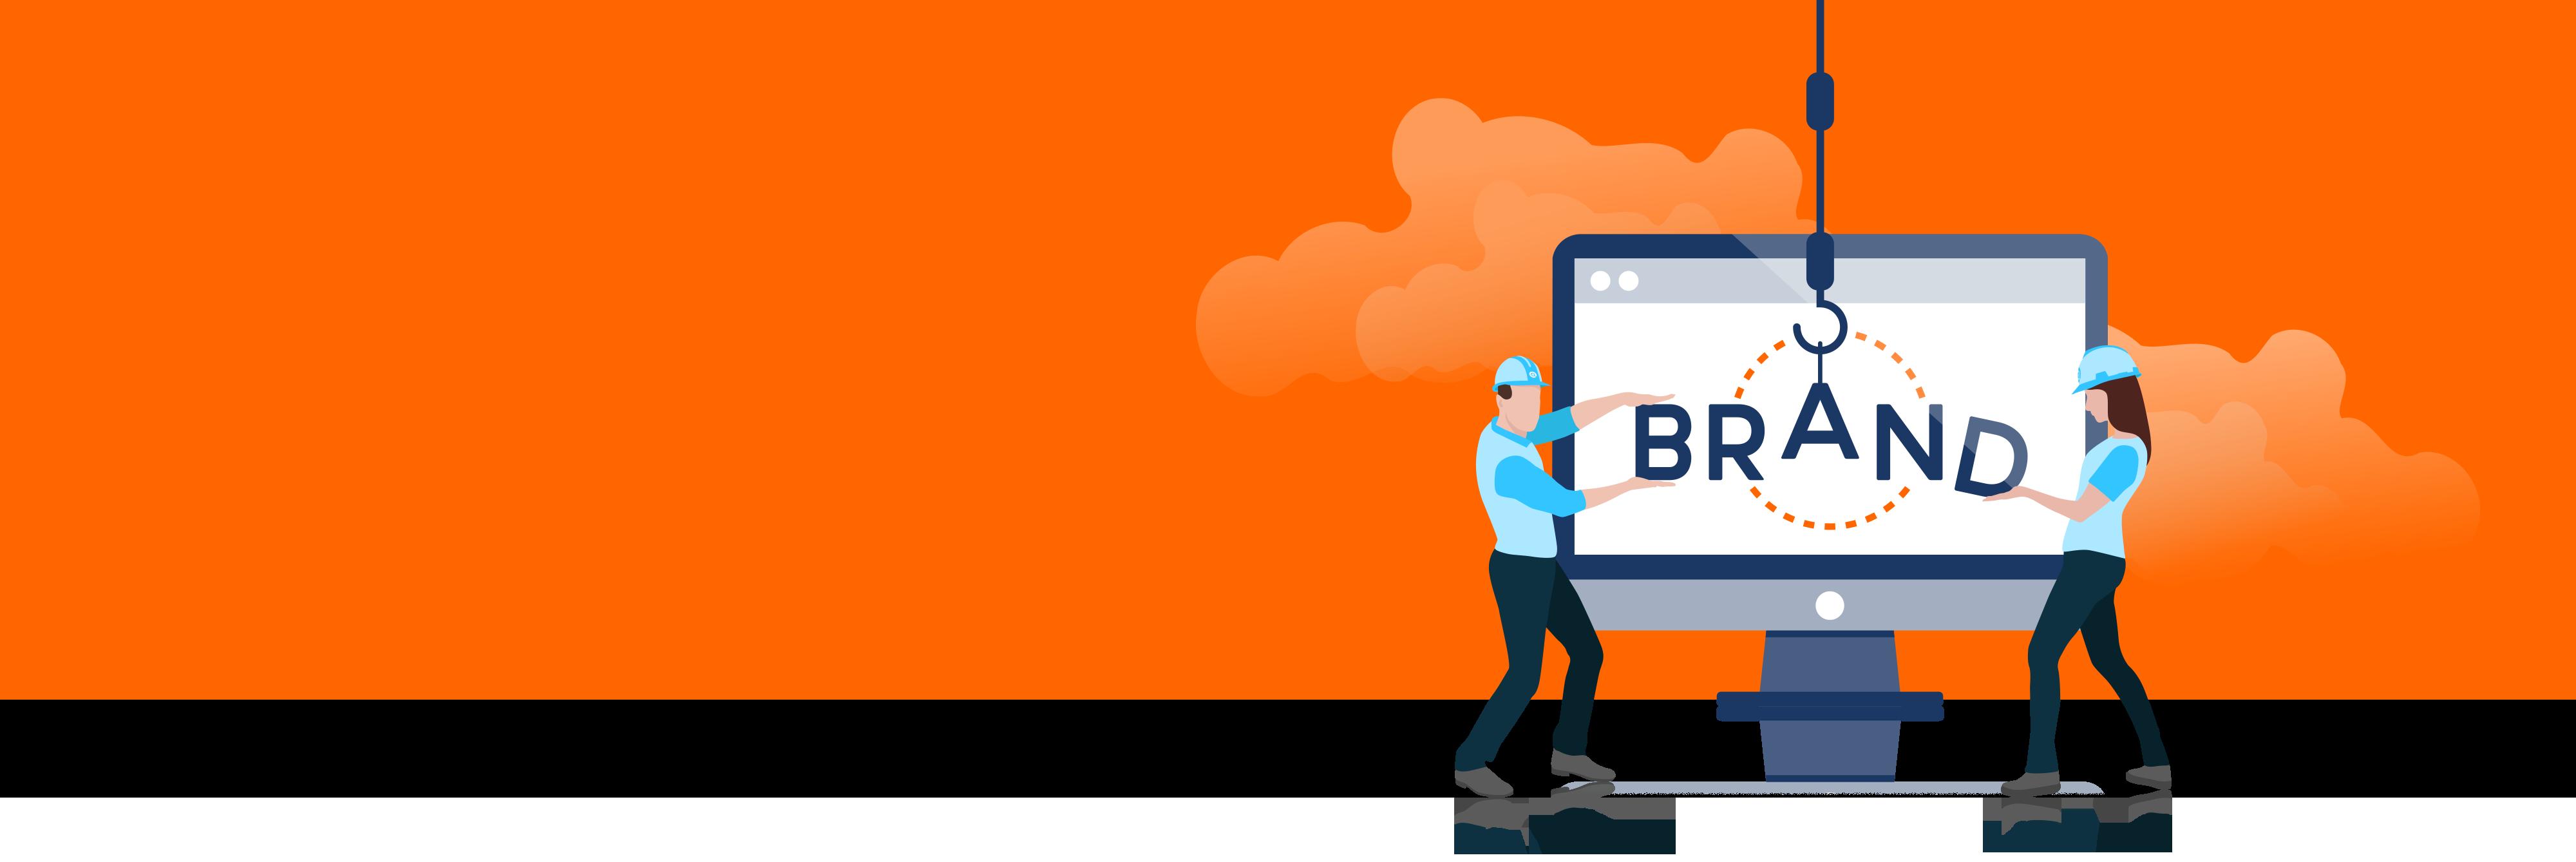 branding-services-rsdm